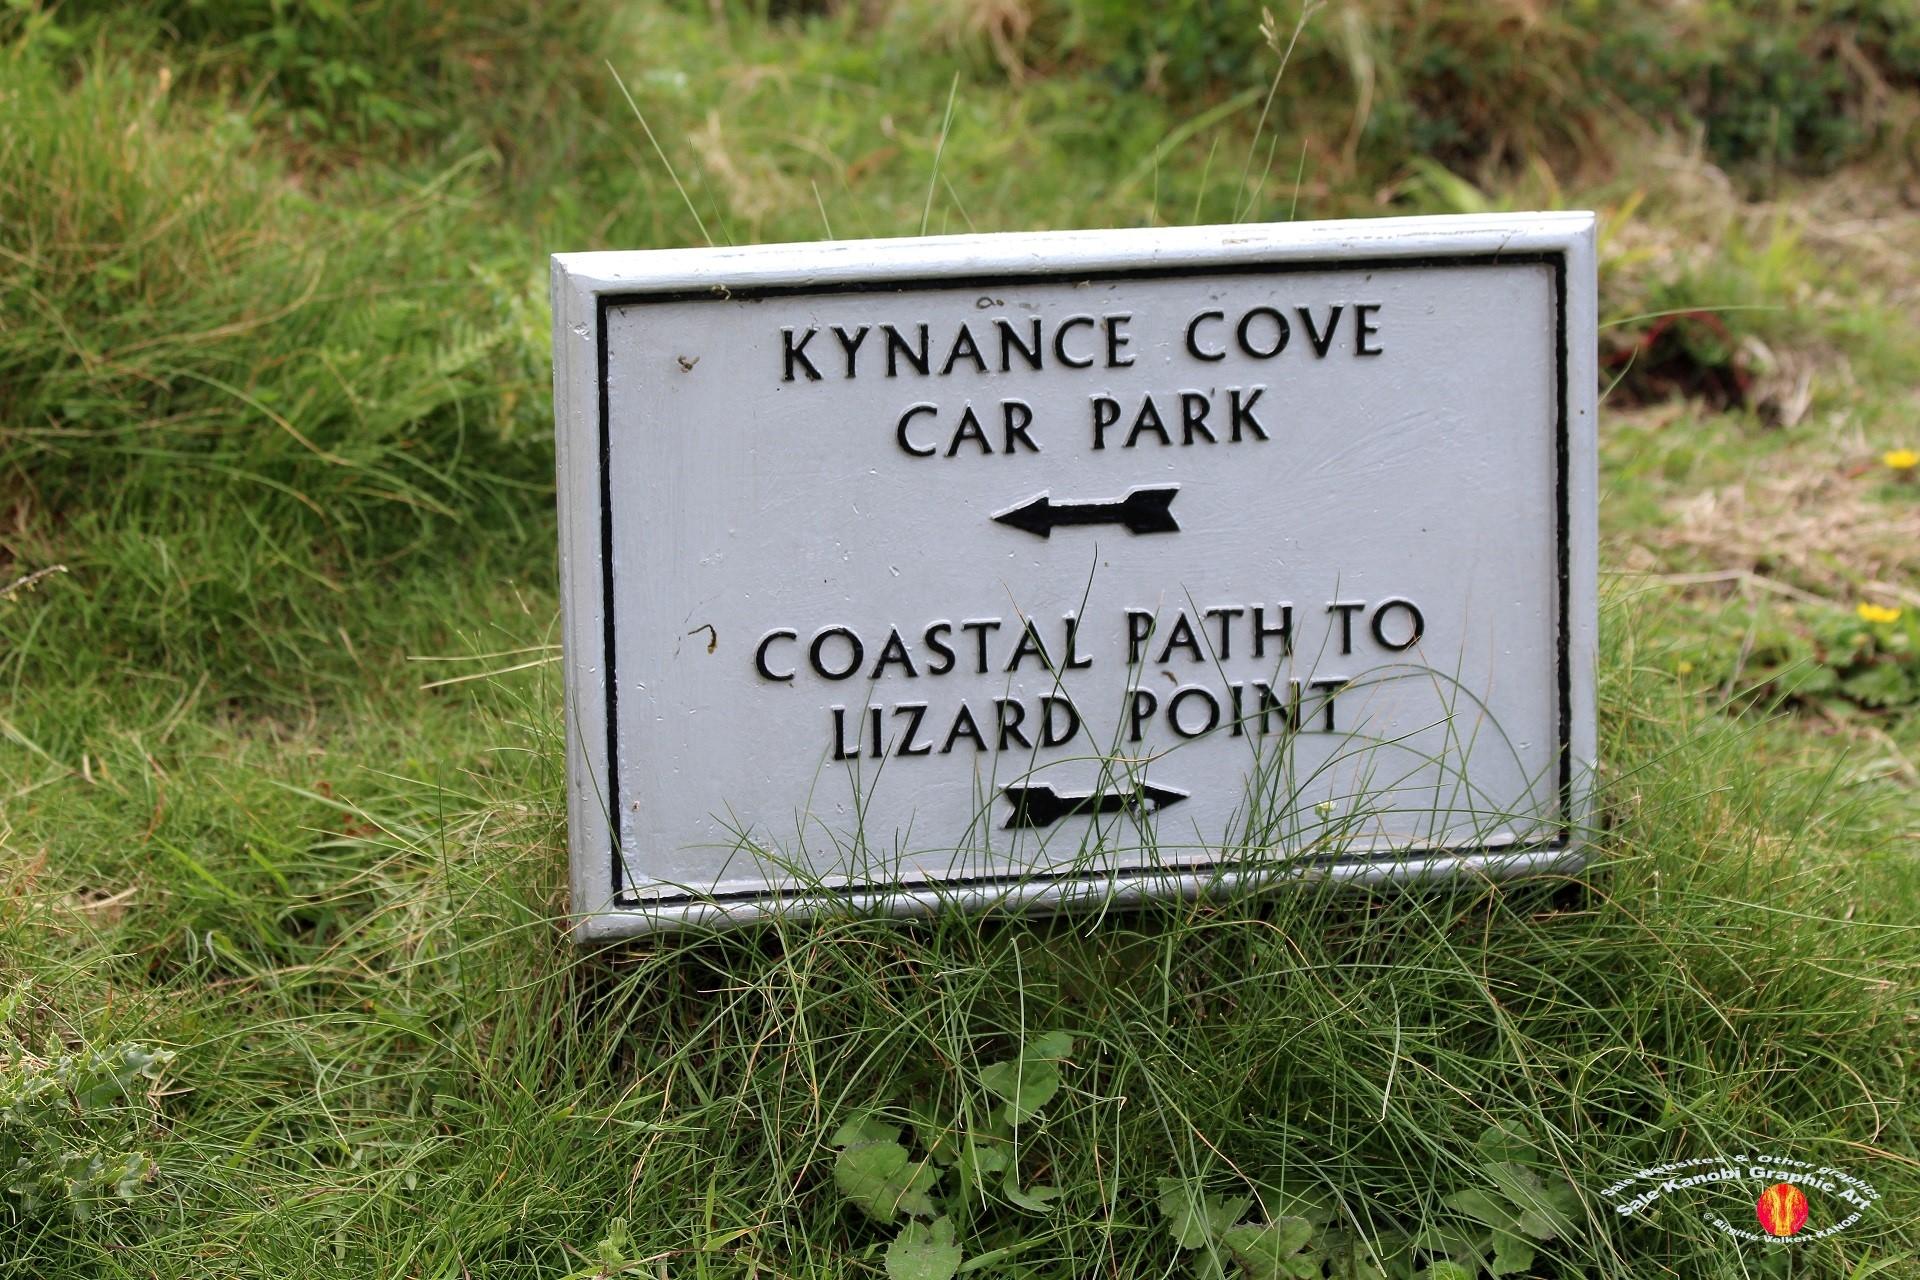 Kynance Cove 1